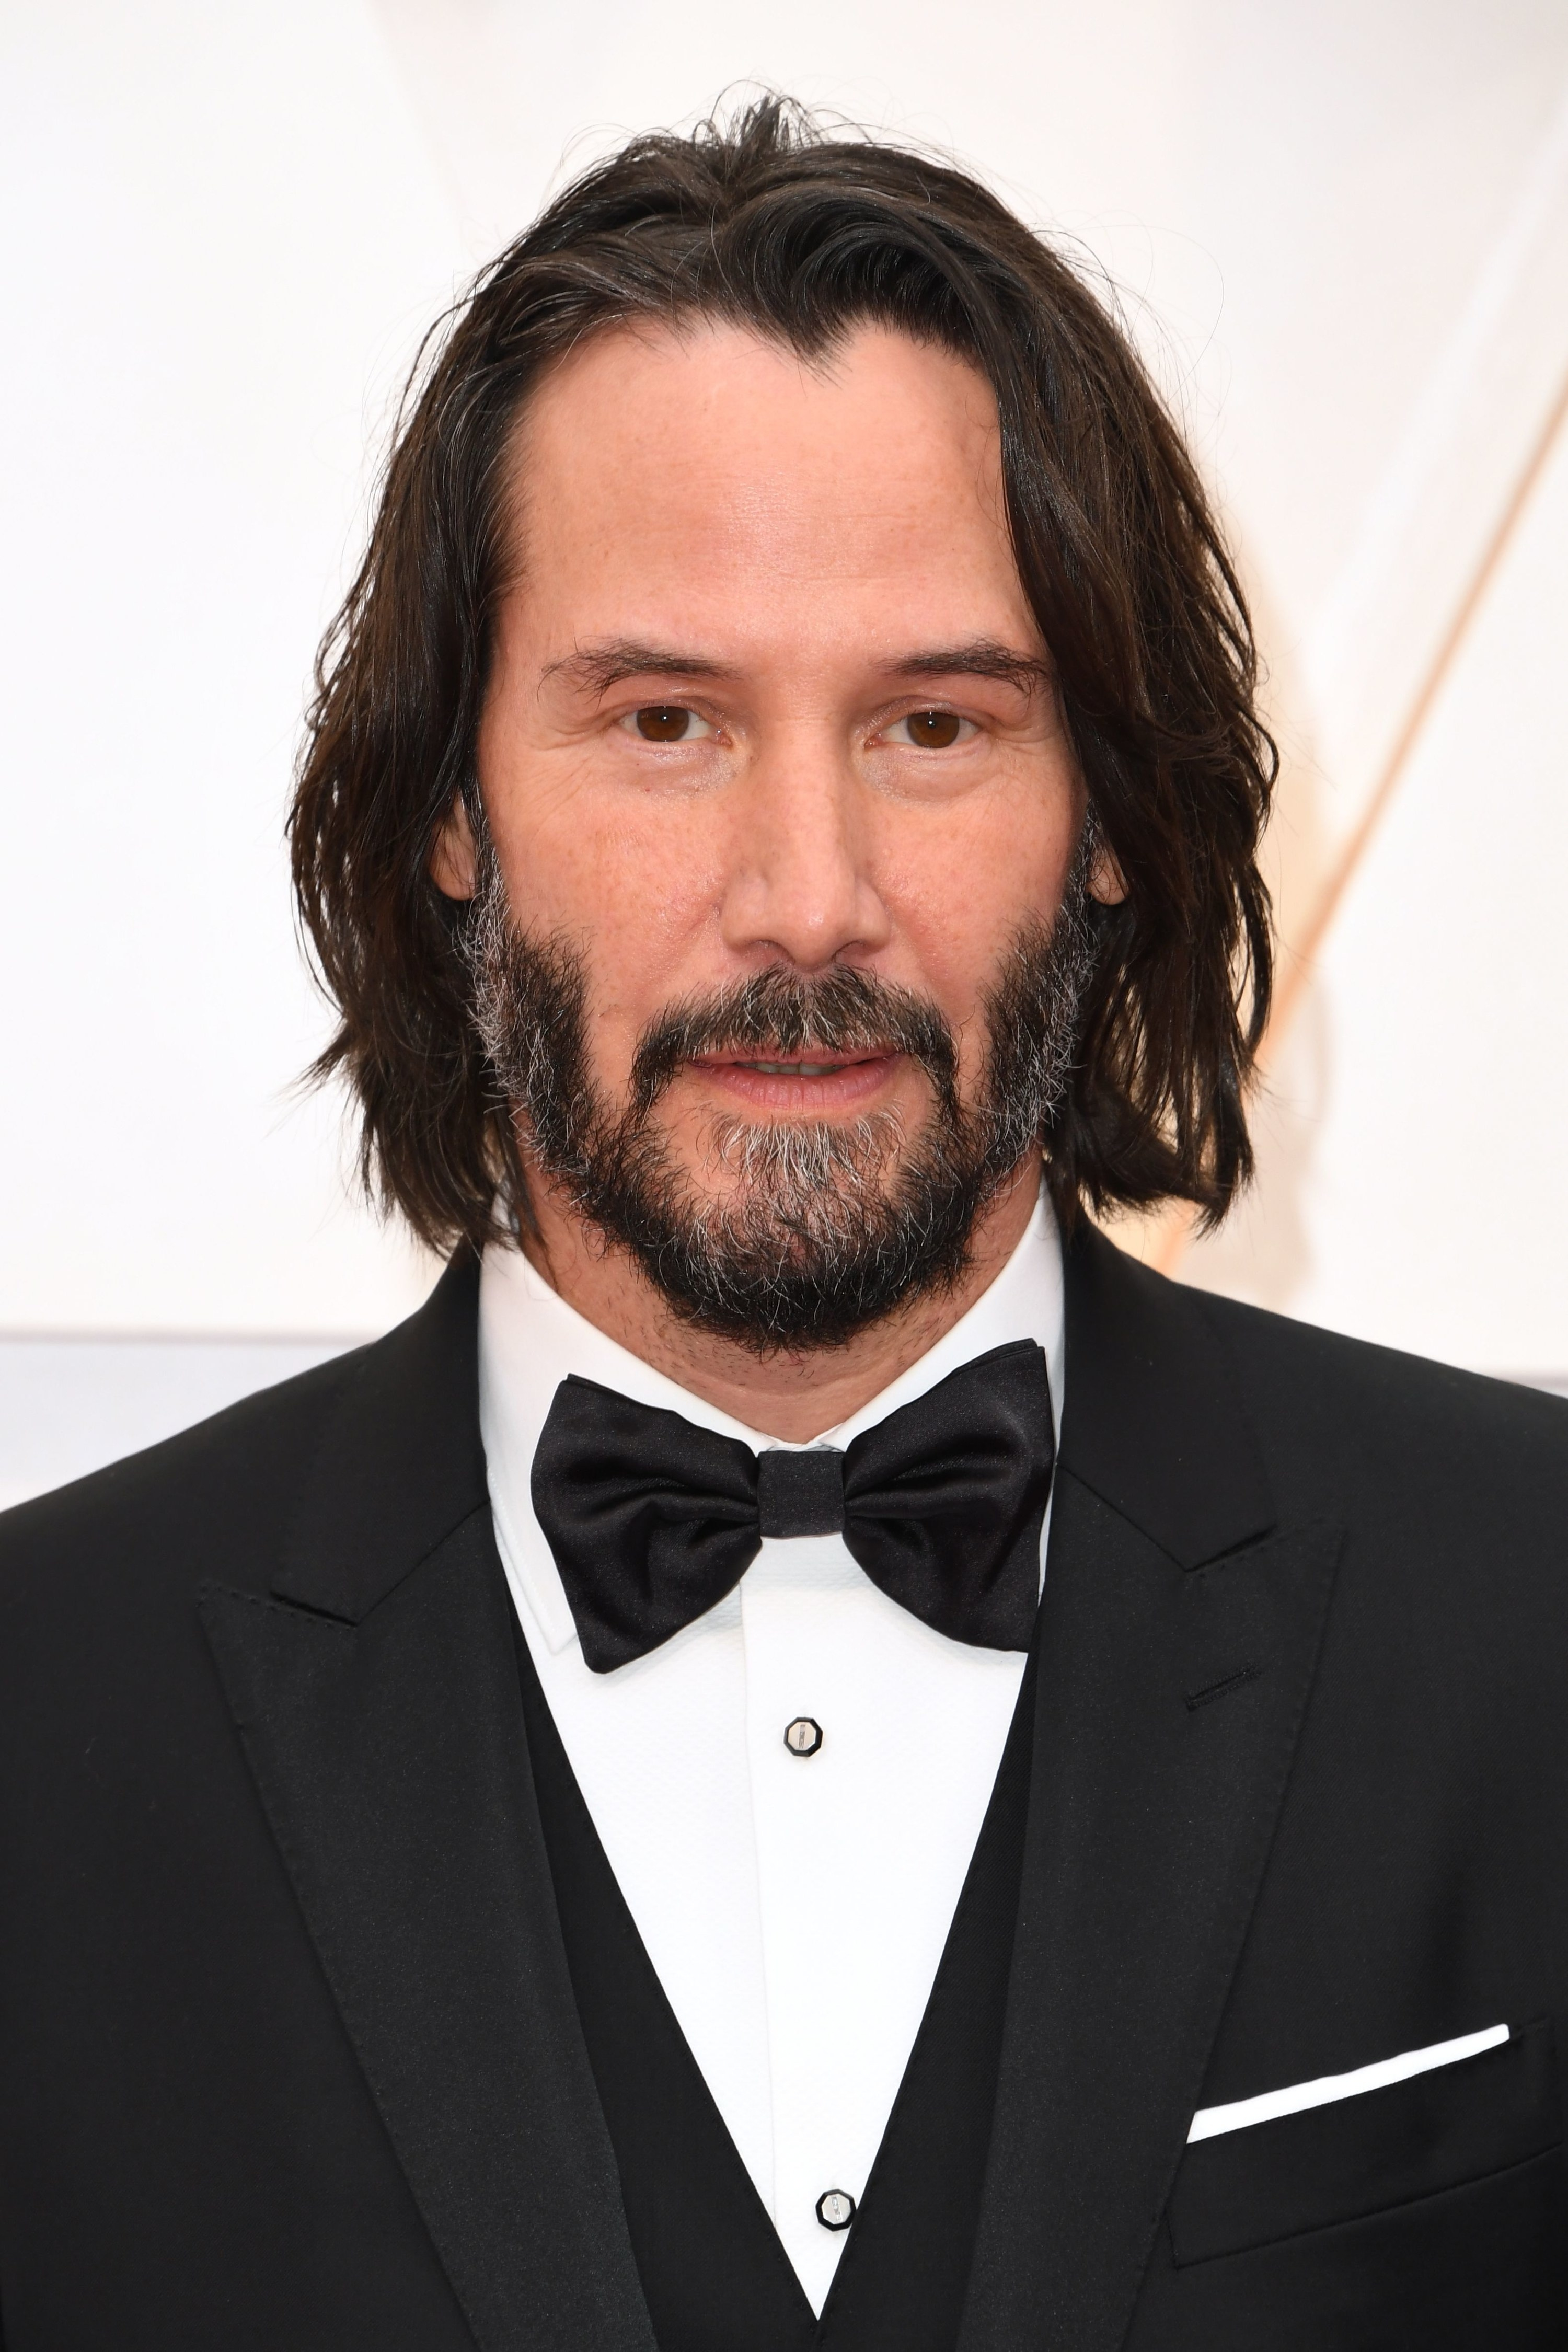 Gray beard, long hair, and black tie